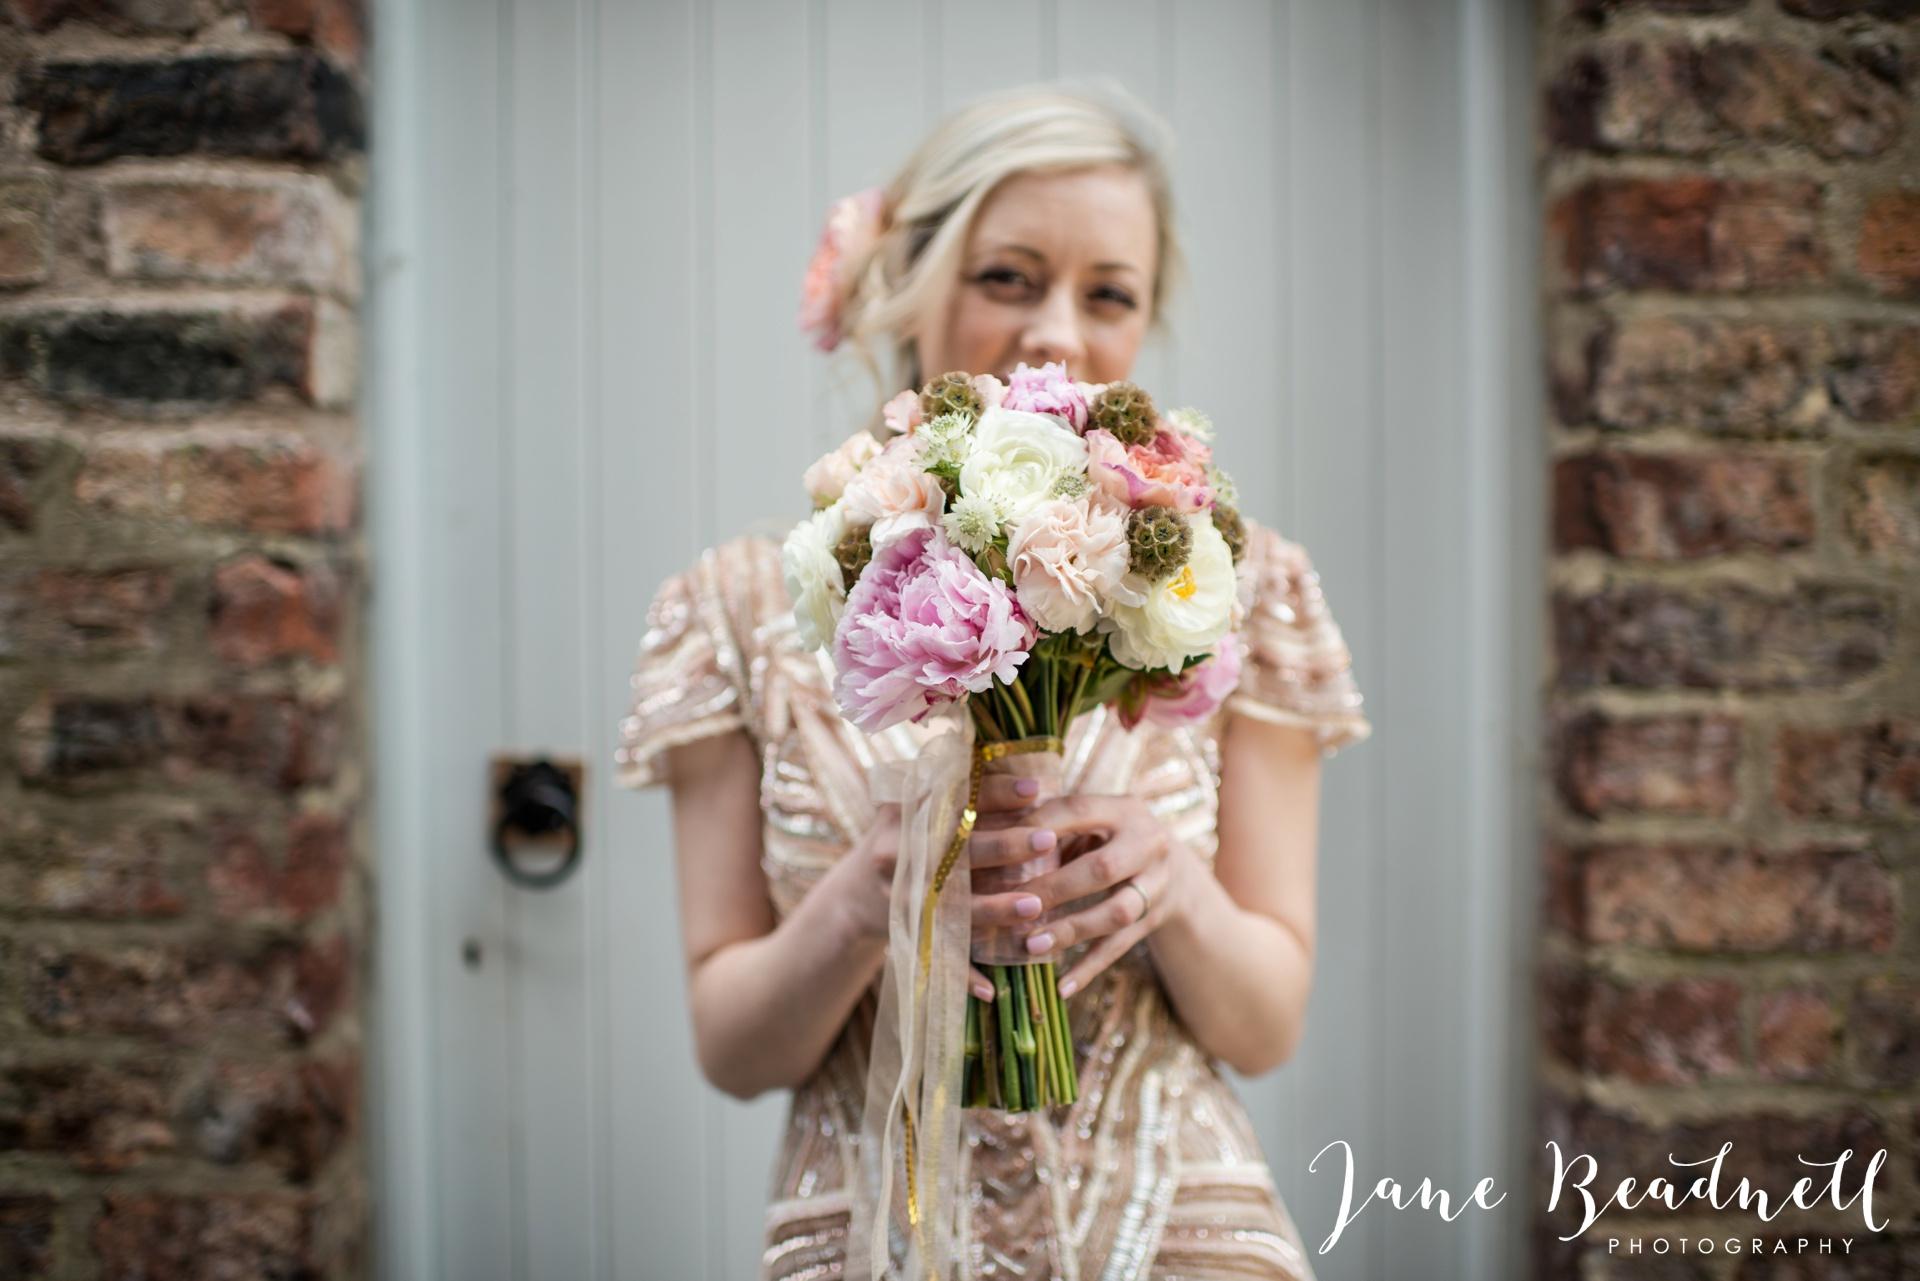 Jane Beadnell fine art wedding photographer York Bridal Photo Shoot_0005